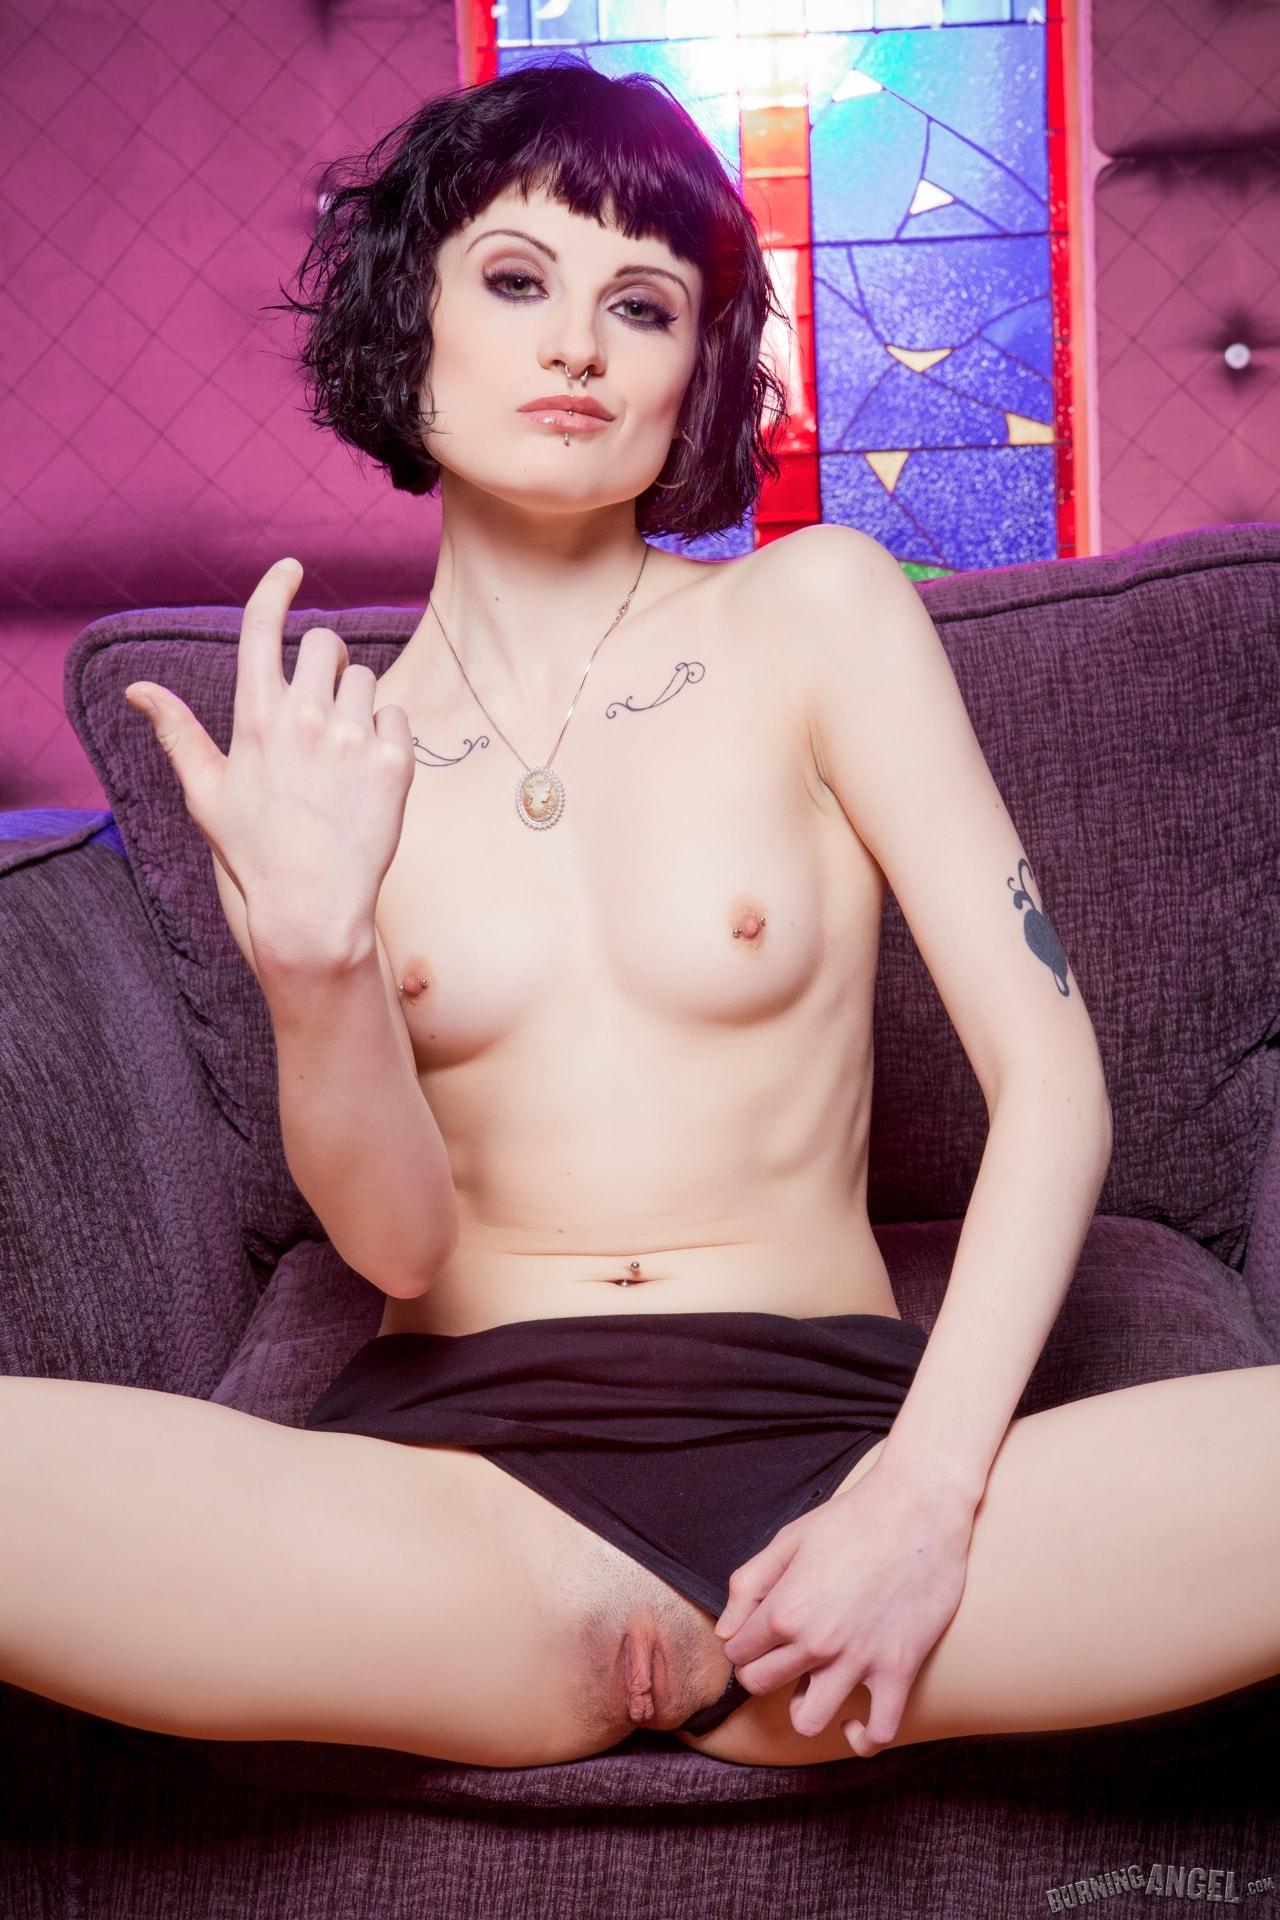 Burning Angel 'Annika POV' starring Annika Amour (Photo 4)